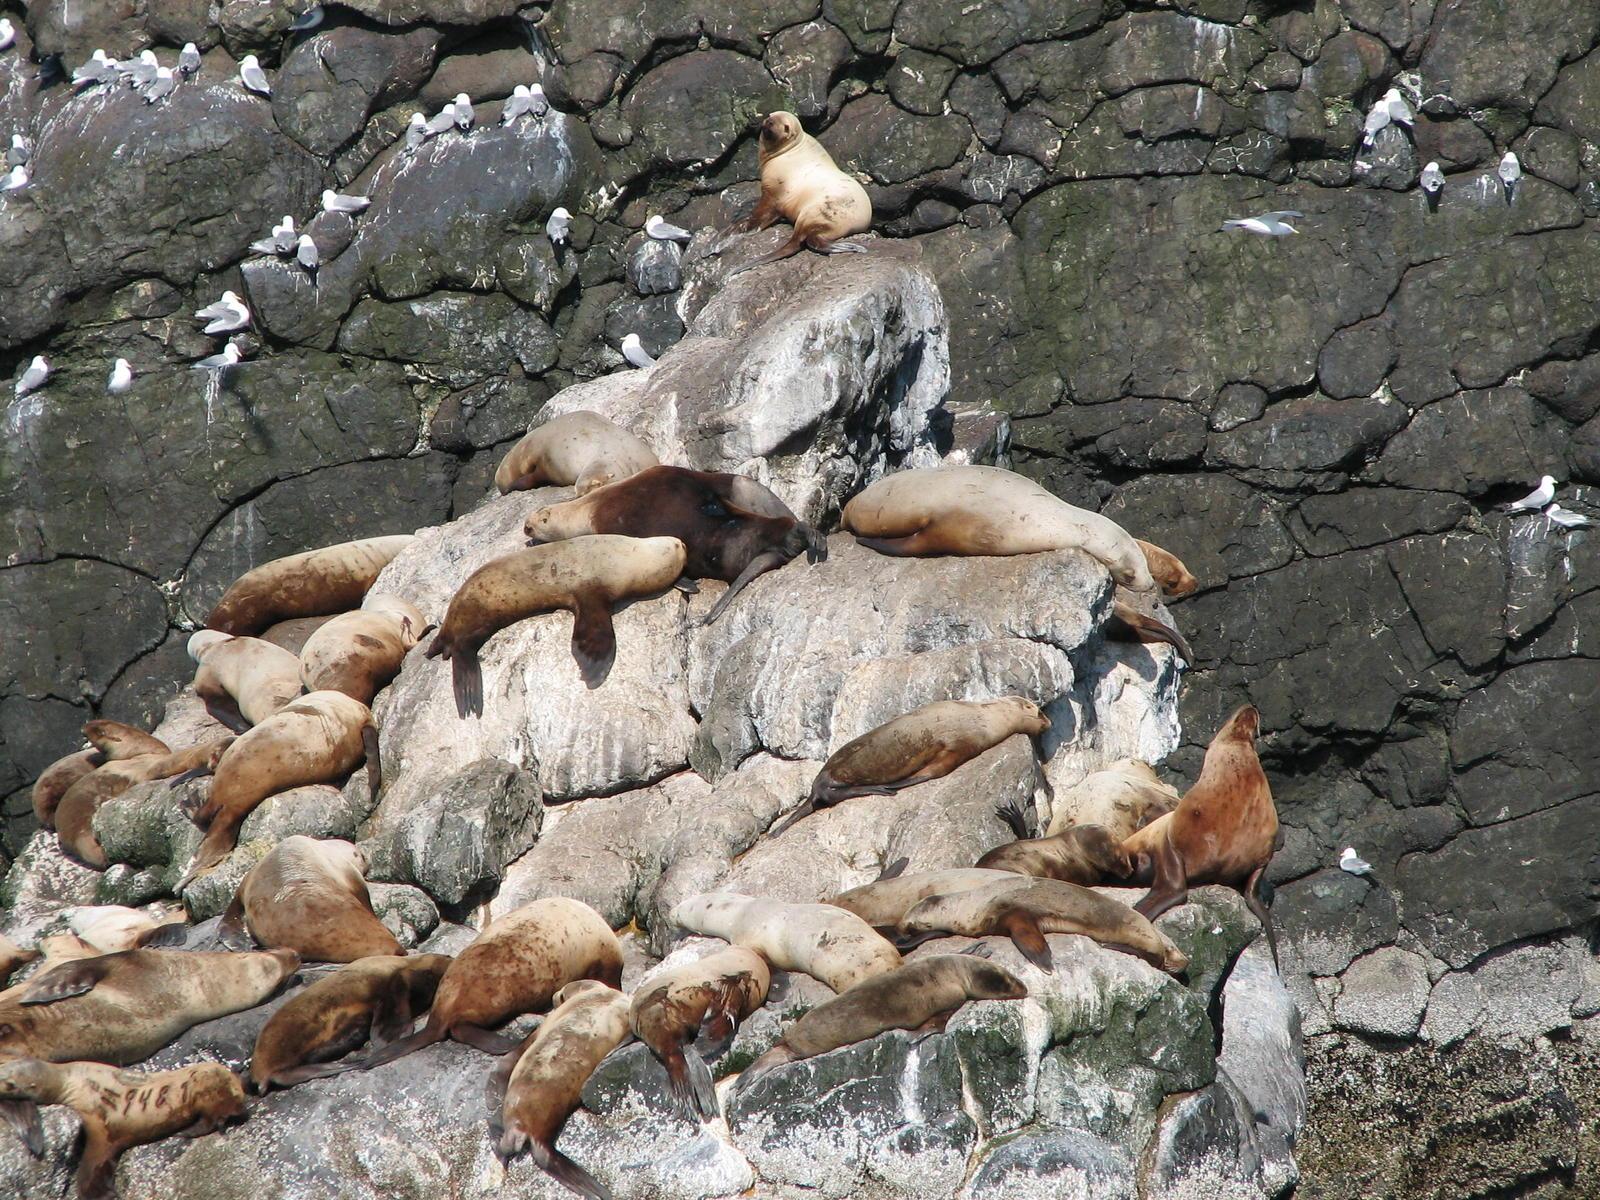 CRAIGSLIST ALASKA ANCHORAGE